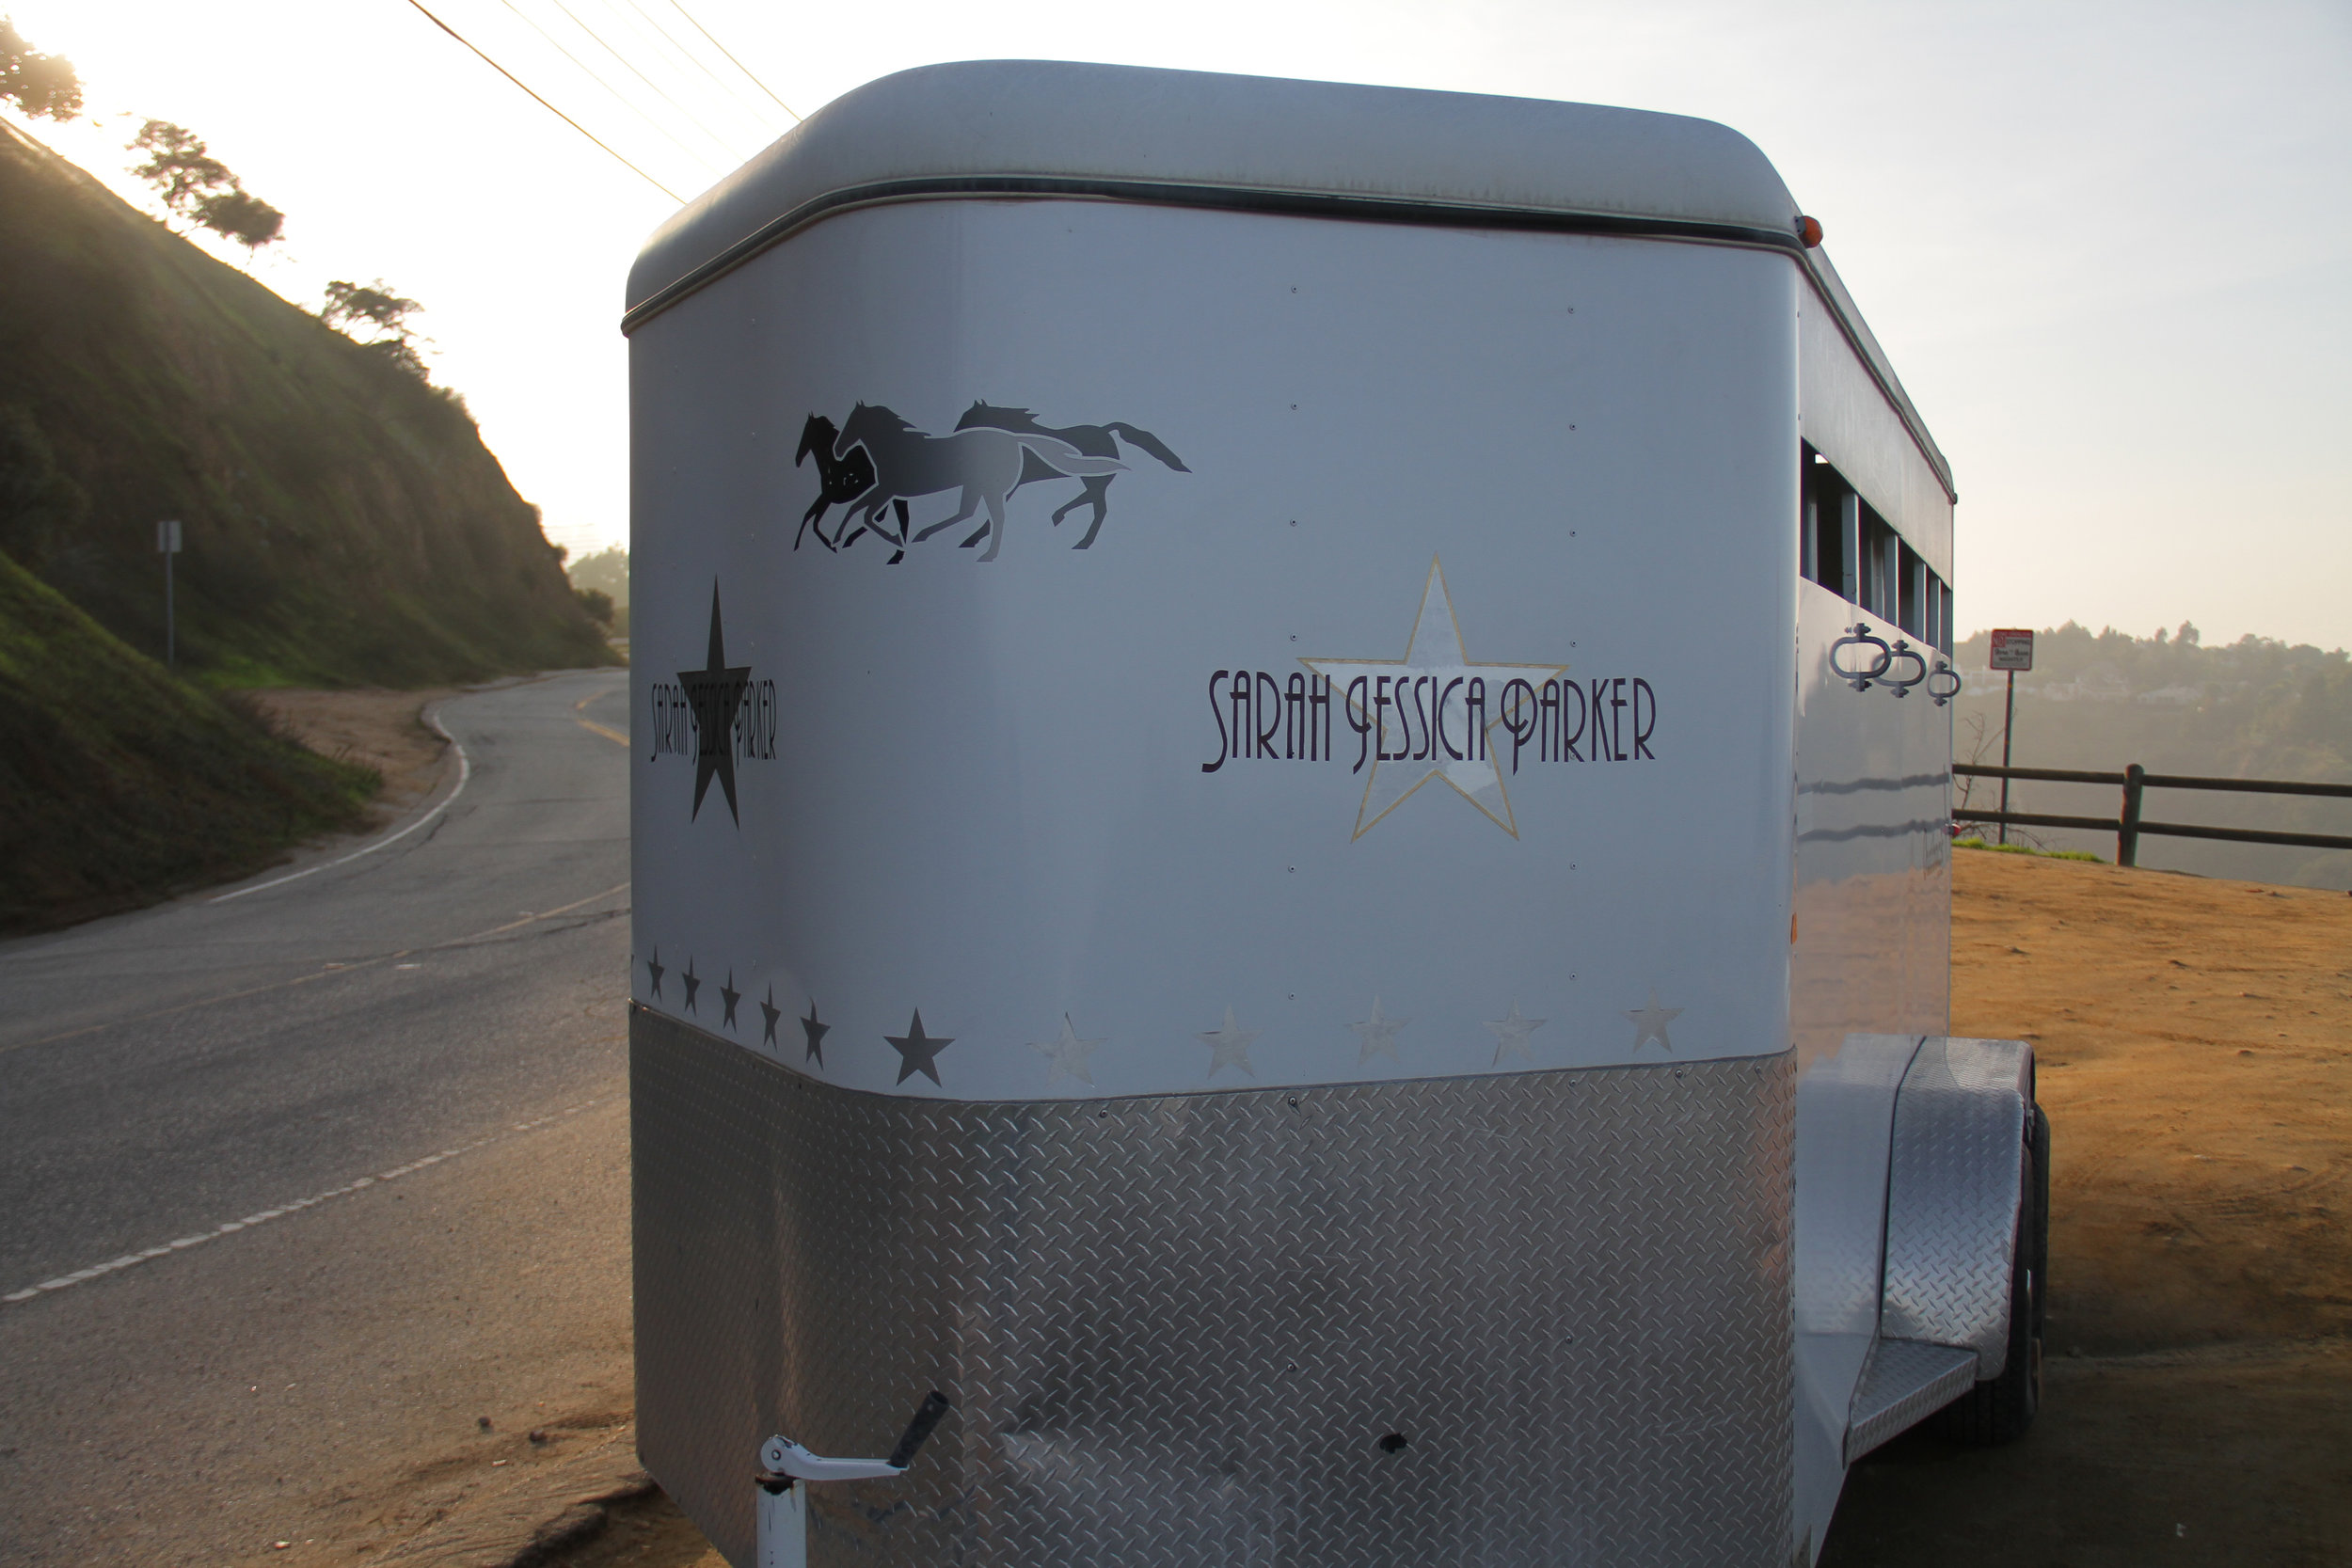 Sarah Jessica Parker Movie Star Horse Trailer